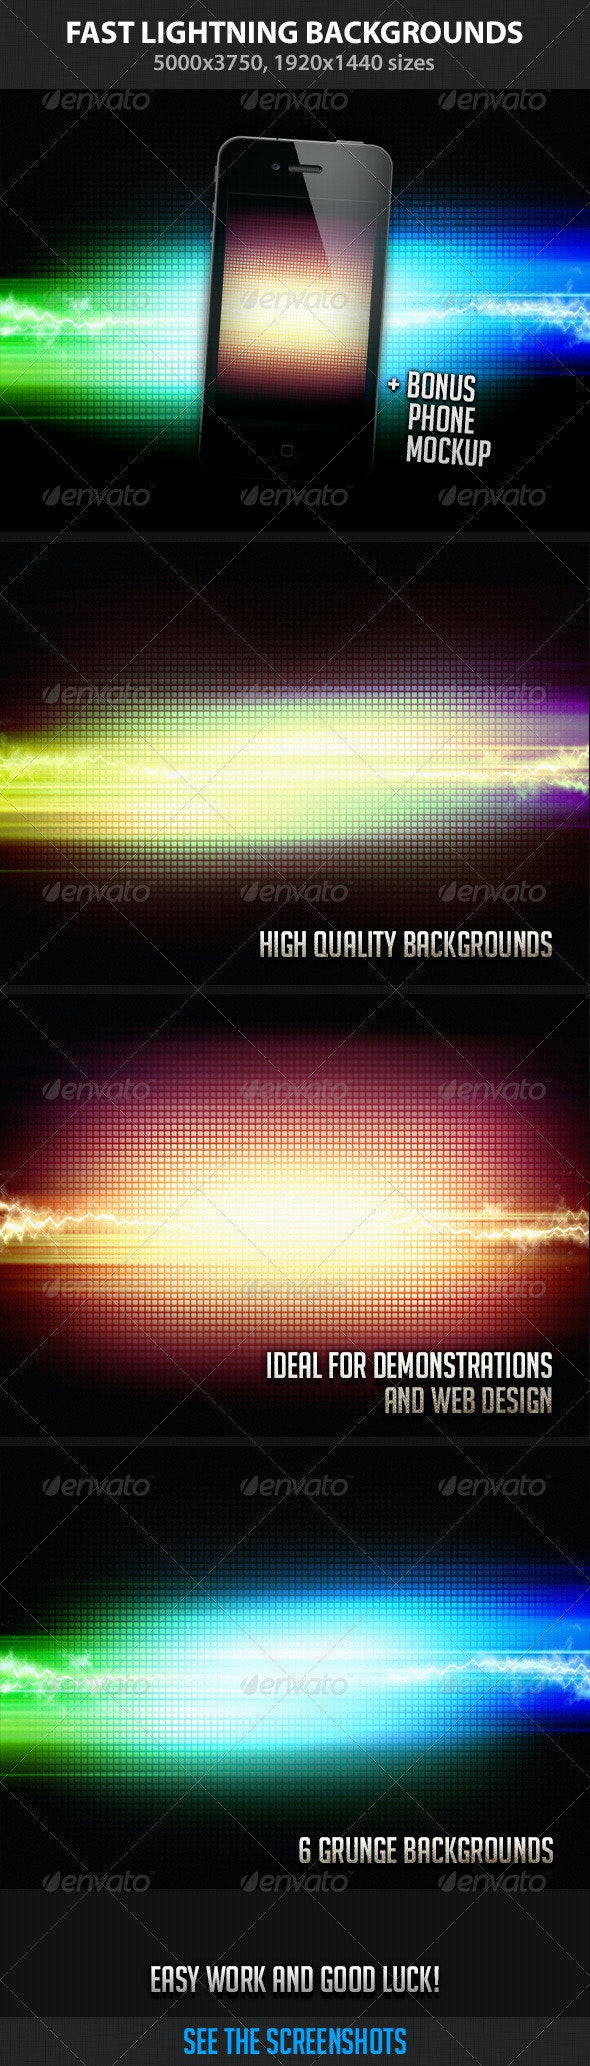 Fast Lightning Backgrounds - Backgrounds Graphics